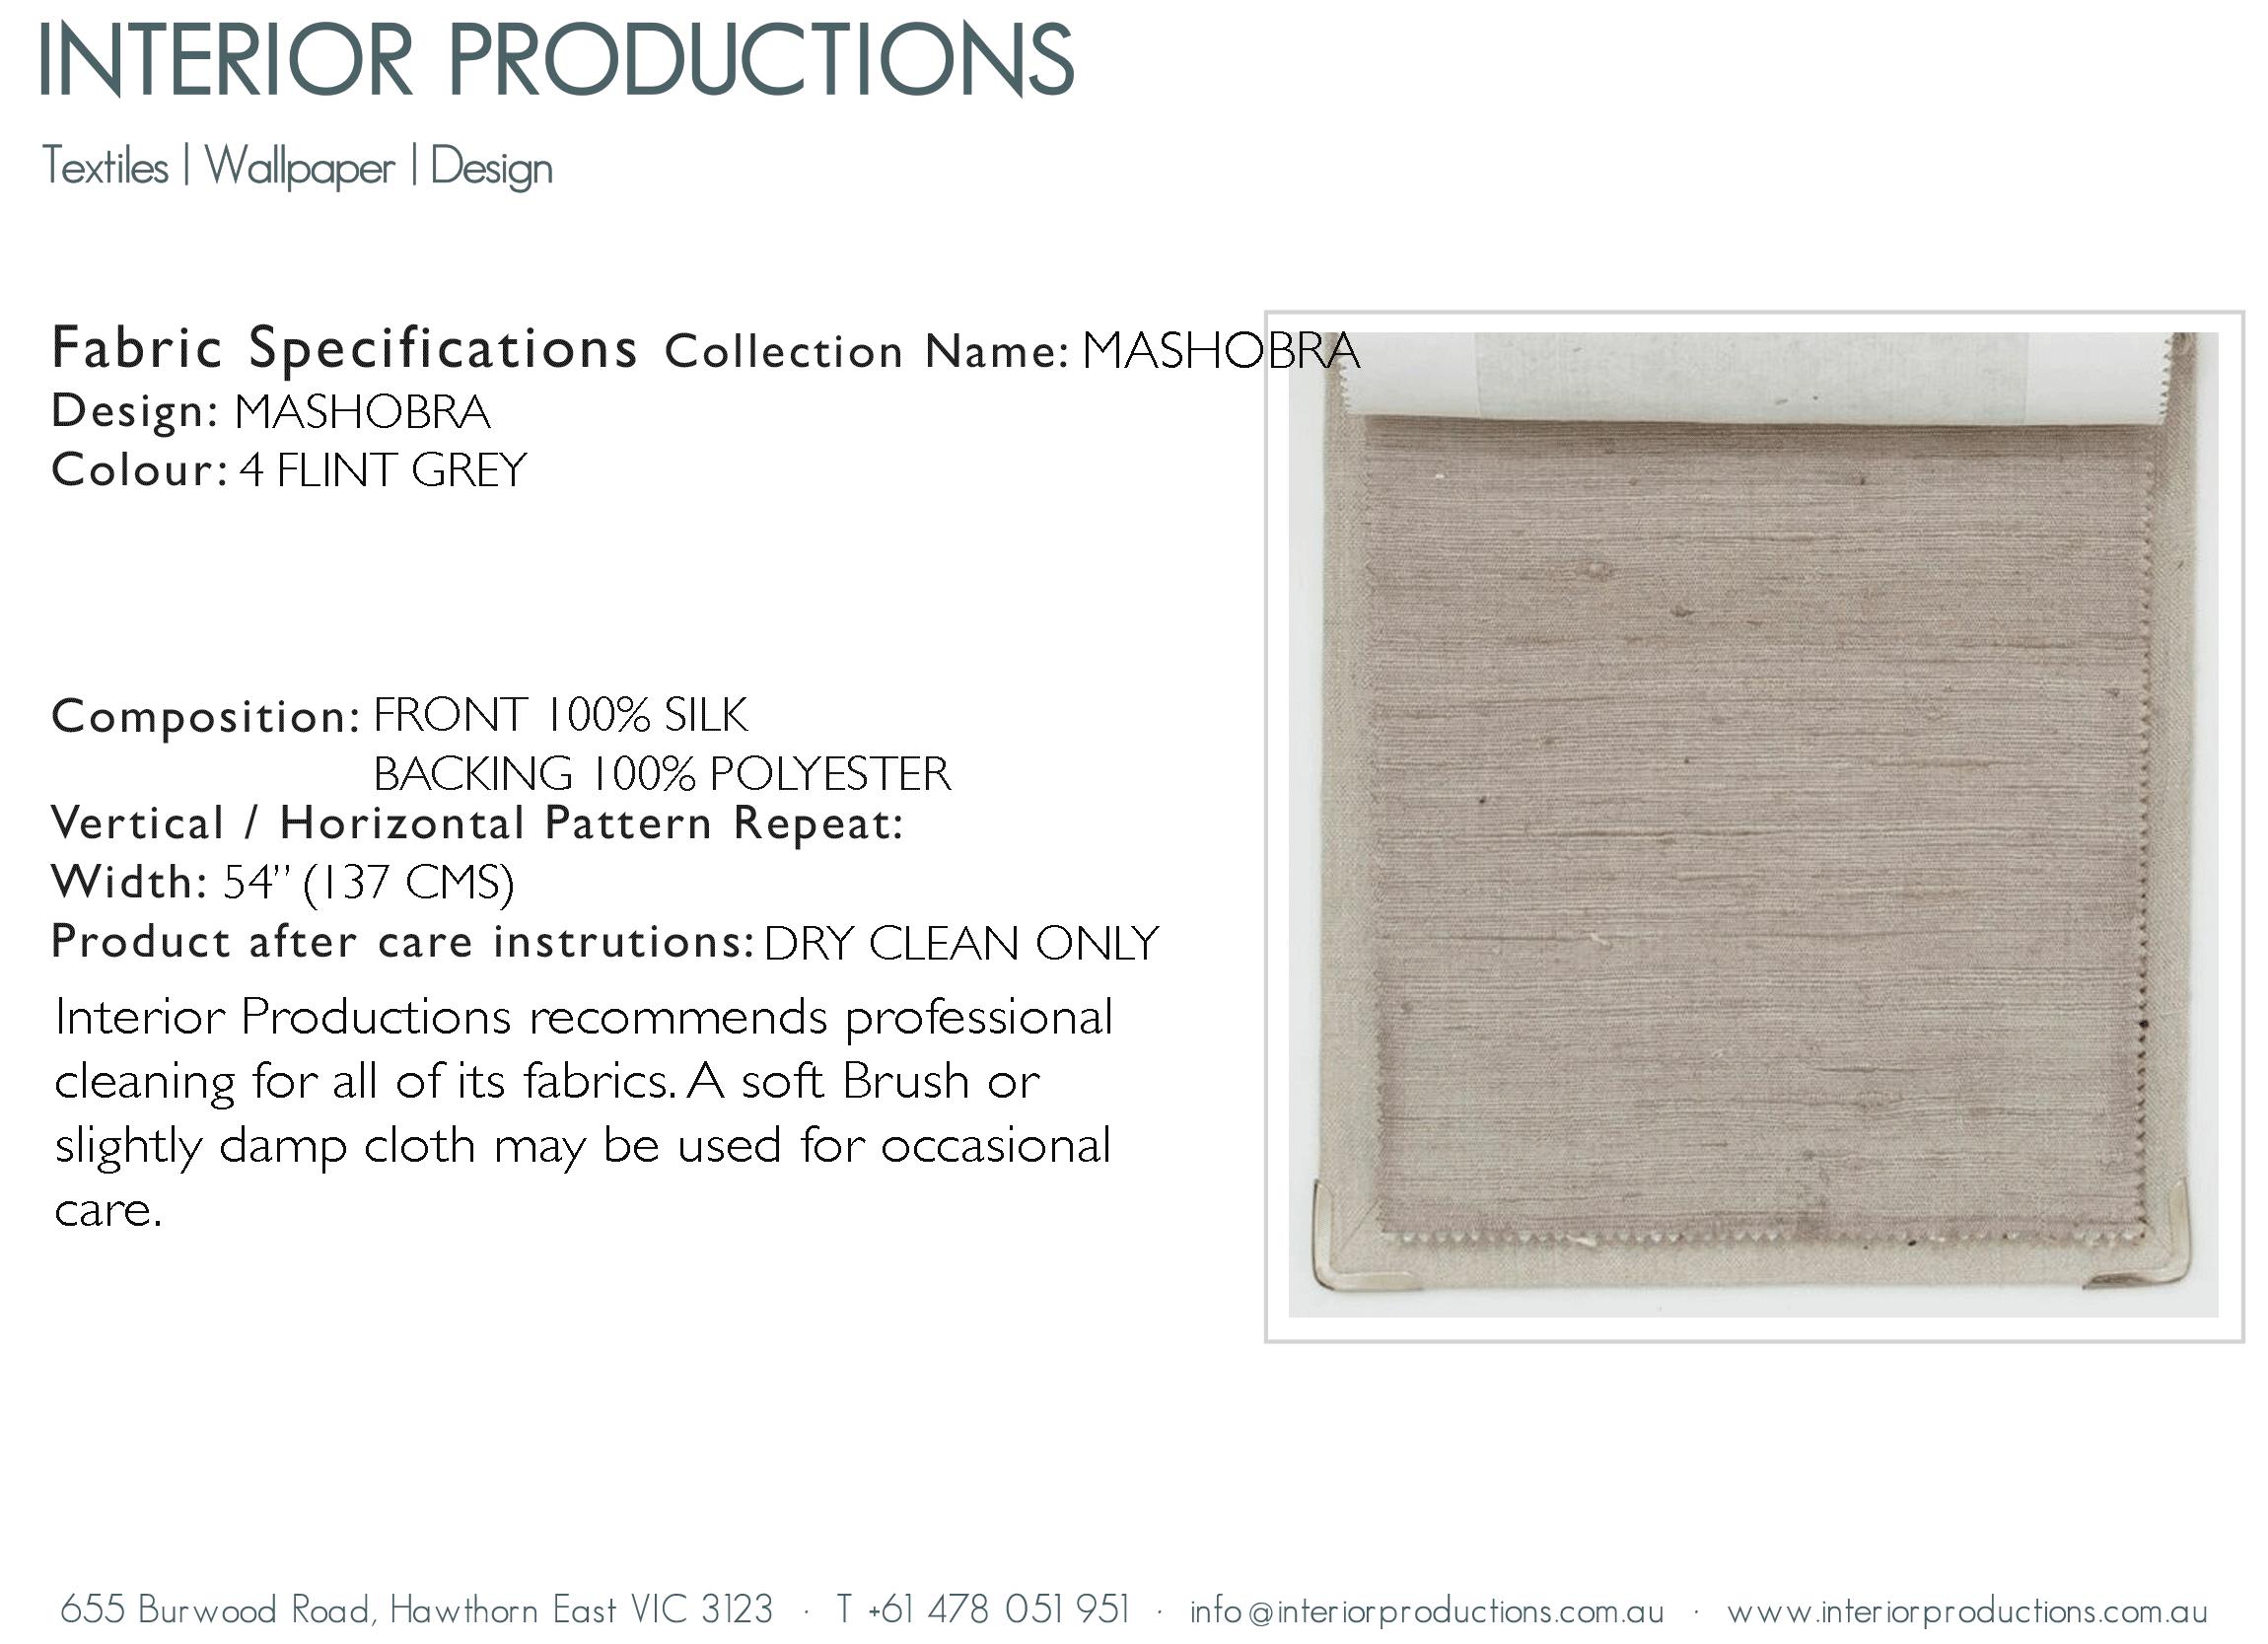 interior_productions_MASHOBRA---4-FLINT-GREY